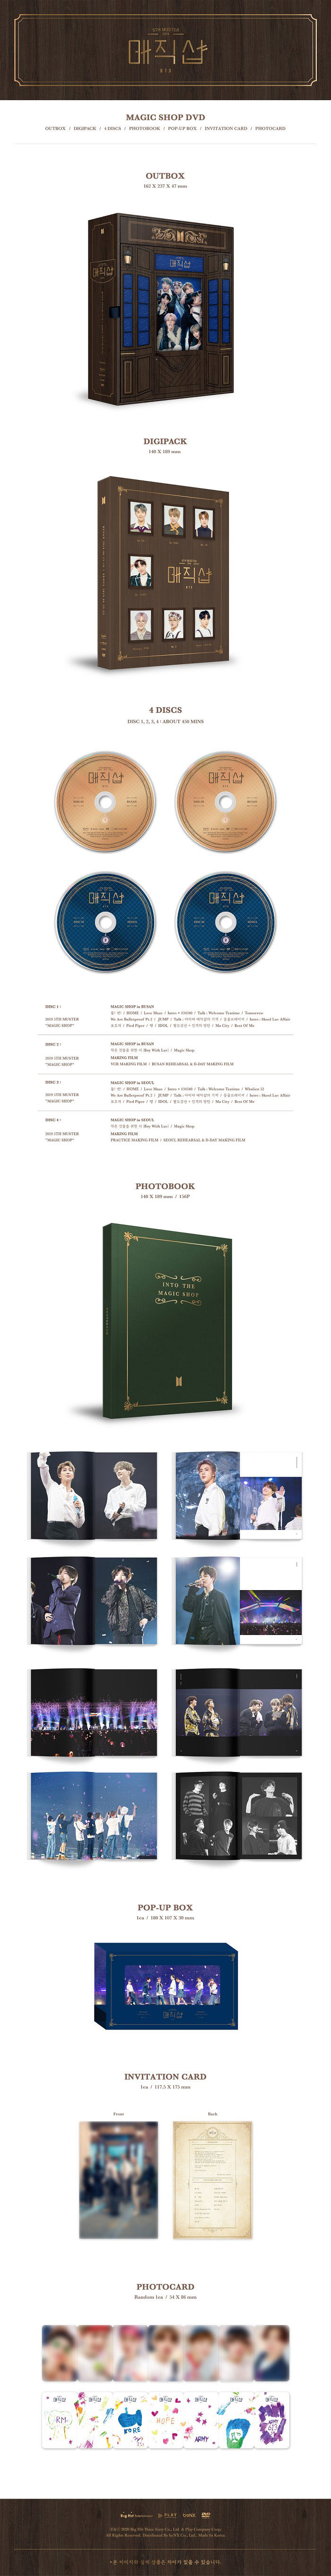 BTS - BTS 5TH MUSTER [MAGIC SHOP] DVD